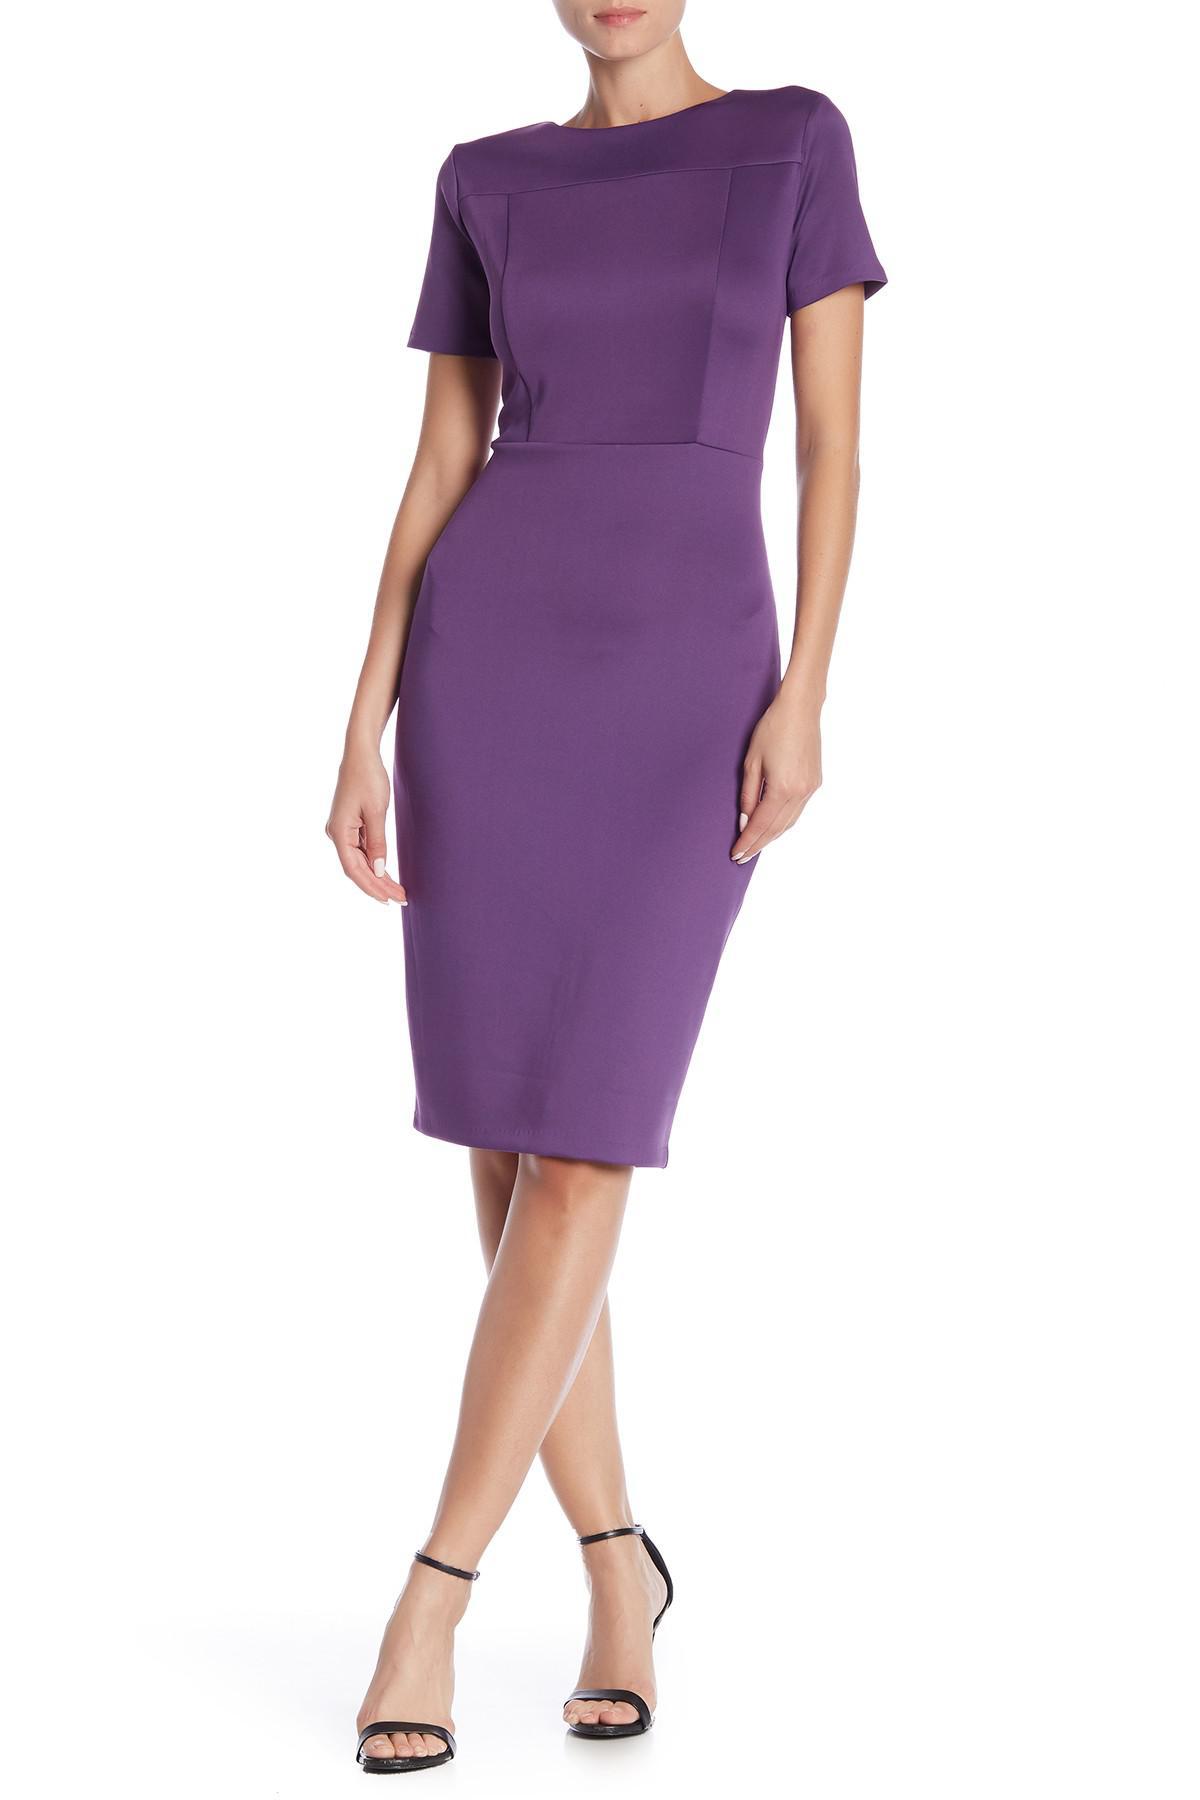 ac4e5989 Lyst - Alexia Admor Sheath Dress in Purple - Save 12.658227848101262%